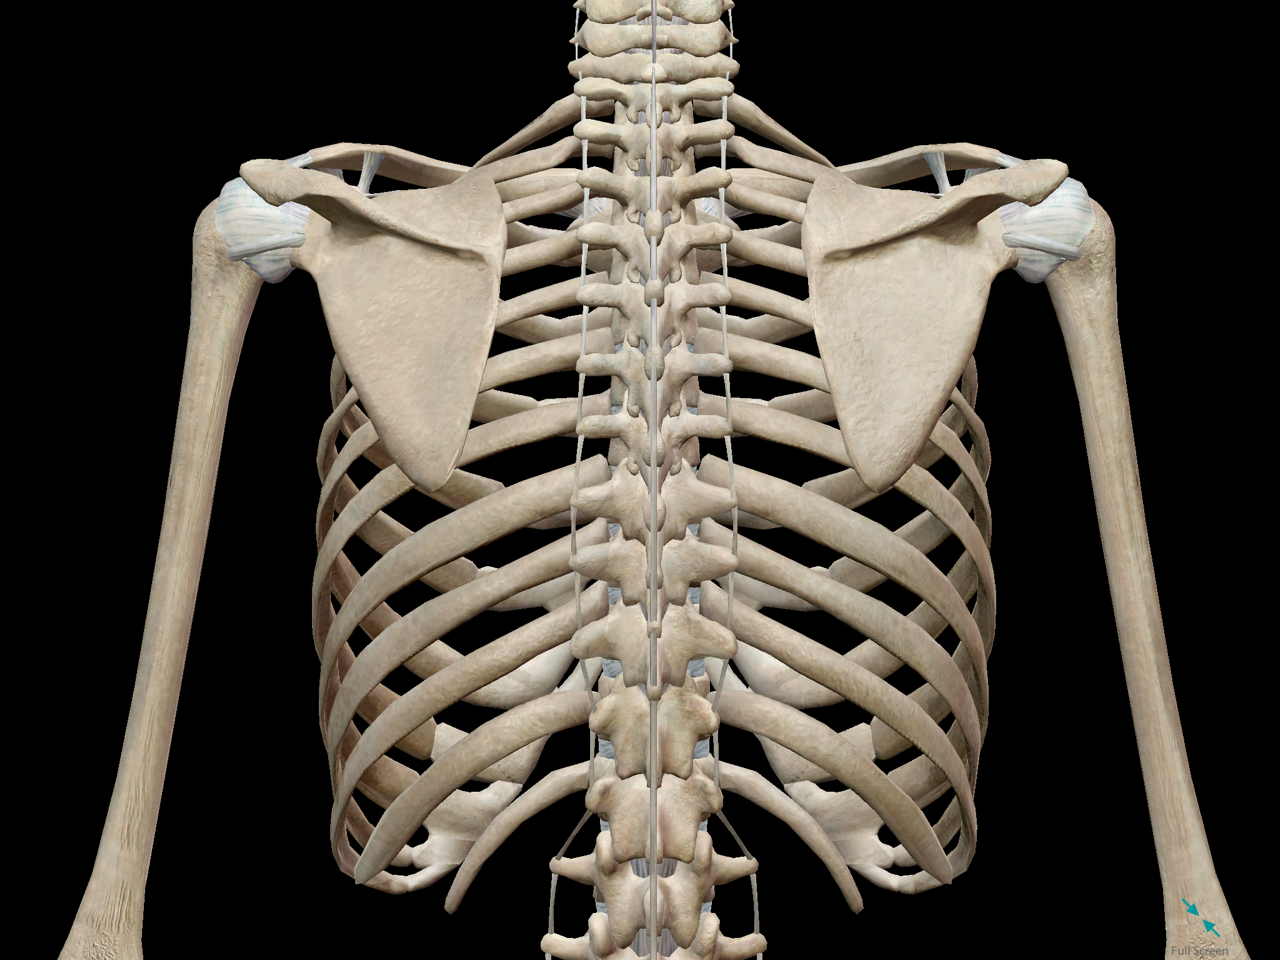 thoracic-cage-bone-ribs-vertebrae-spine.png